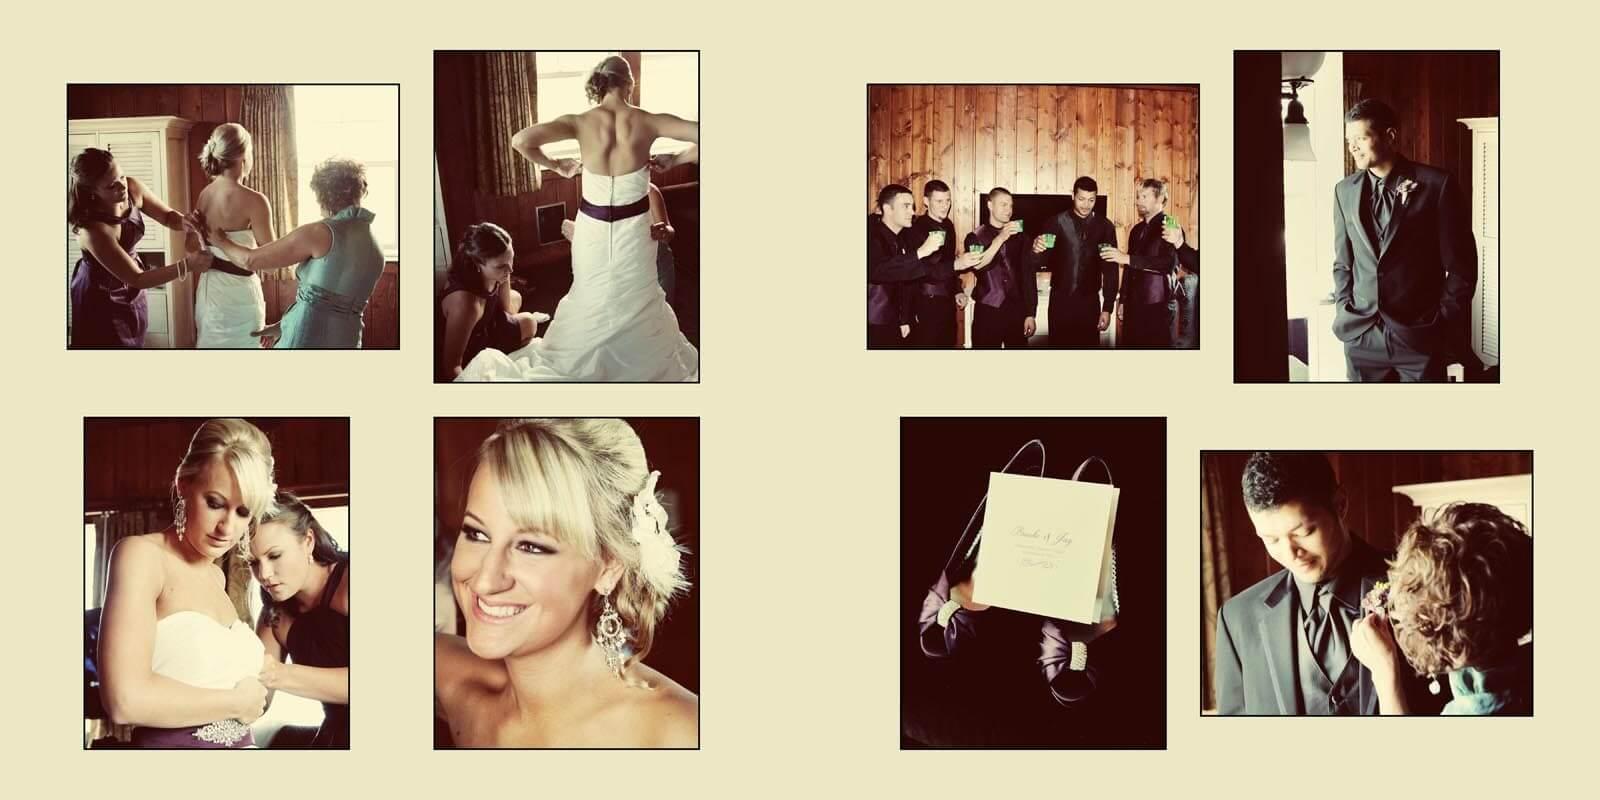 gearheart-cannon-beach-mcmenamins-oregon-coast-wedding-002-003.jpg